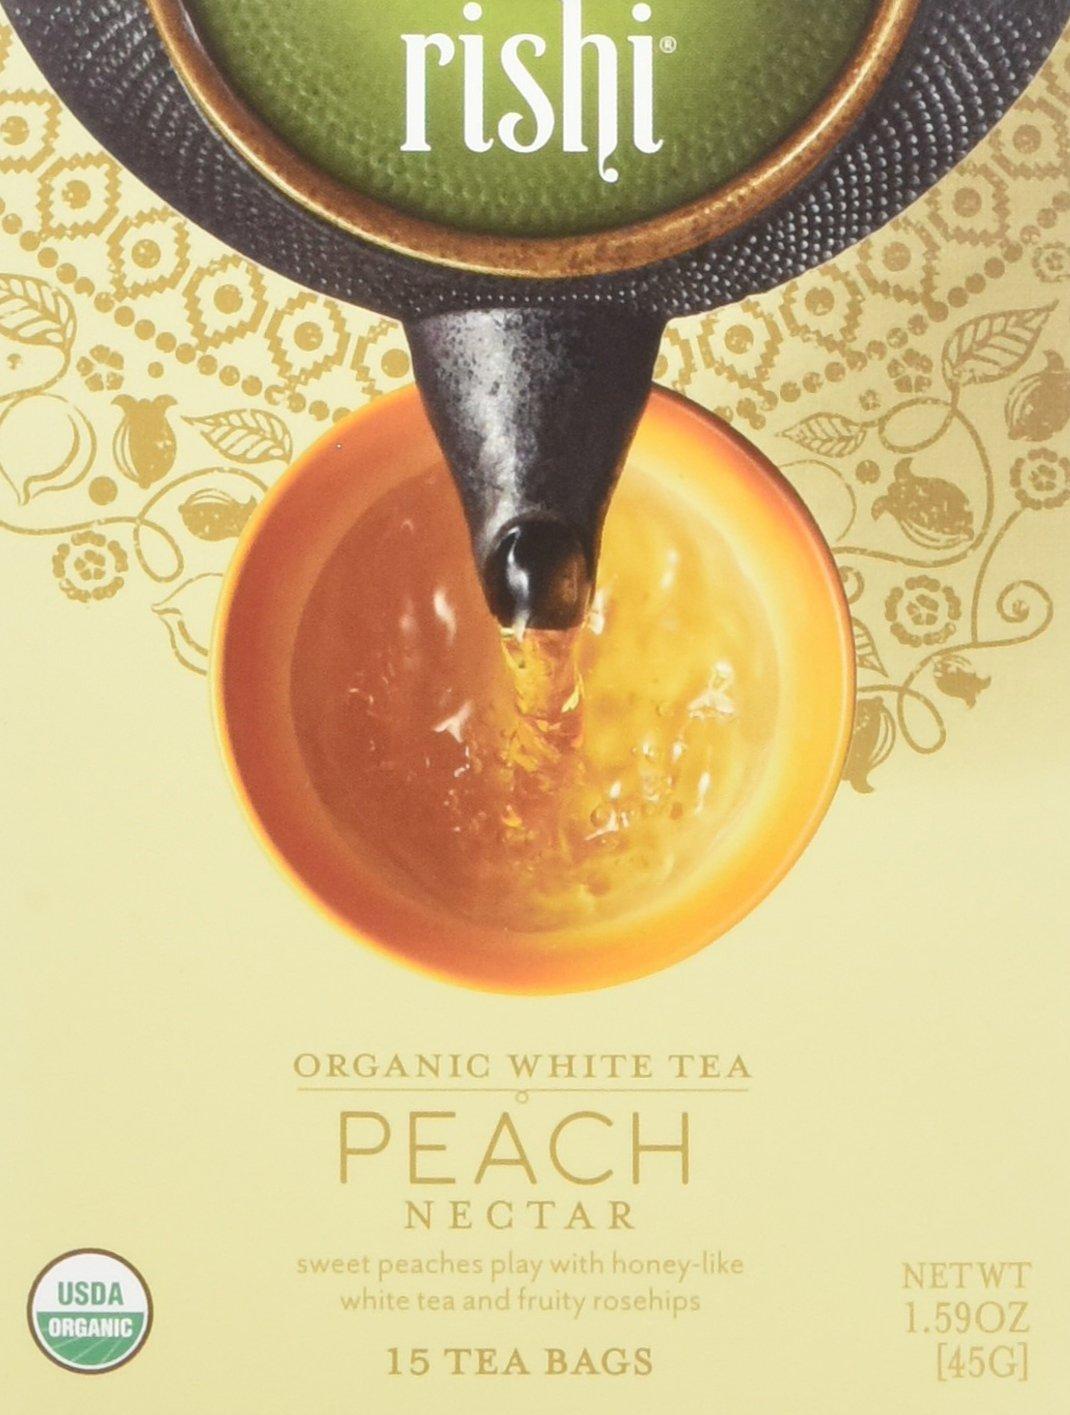 Rishi Peach Nectar Tea, Organic White Tea Sachet Bags, 15 Count